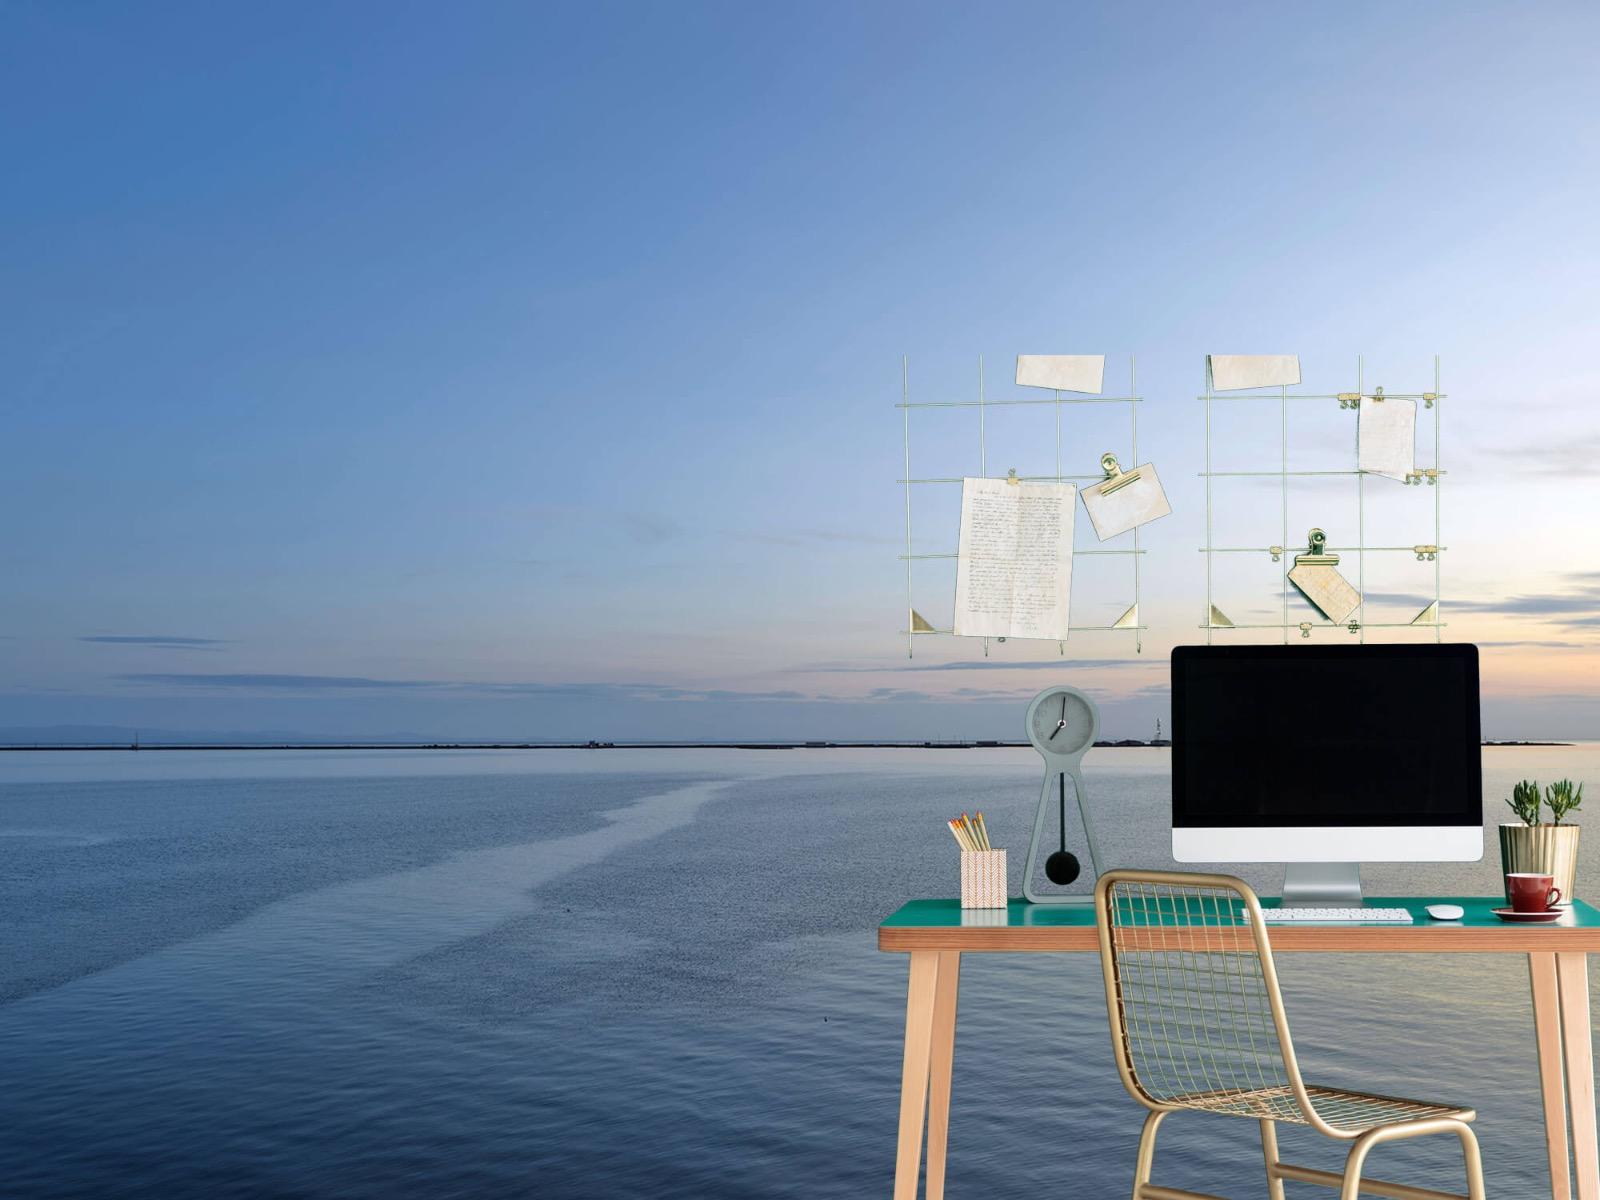 Zeeën en Oceanen - Zee en zonsopkomst - Wallexclusive - Woonkamer 8